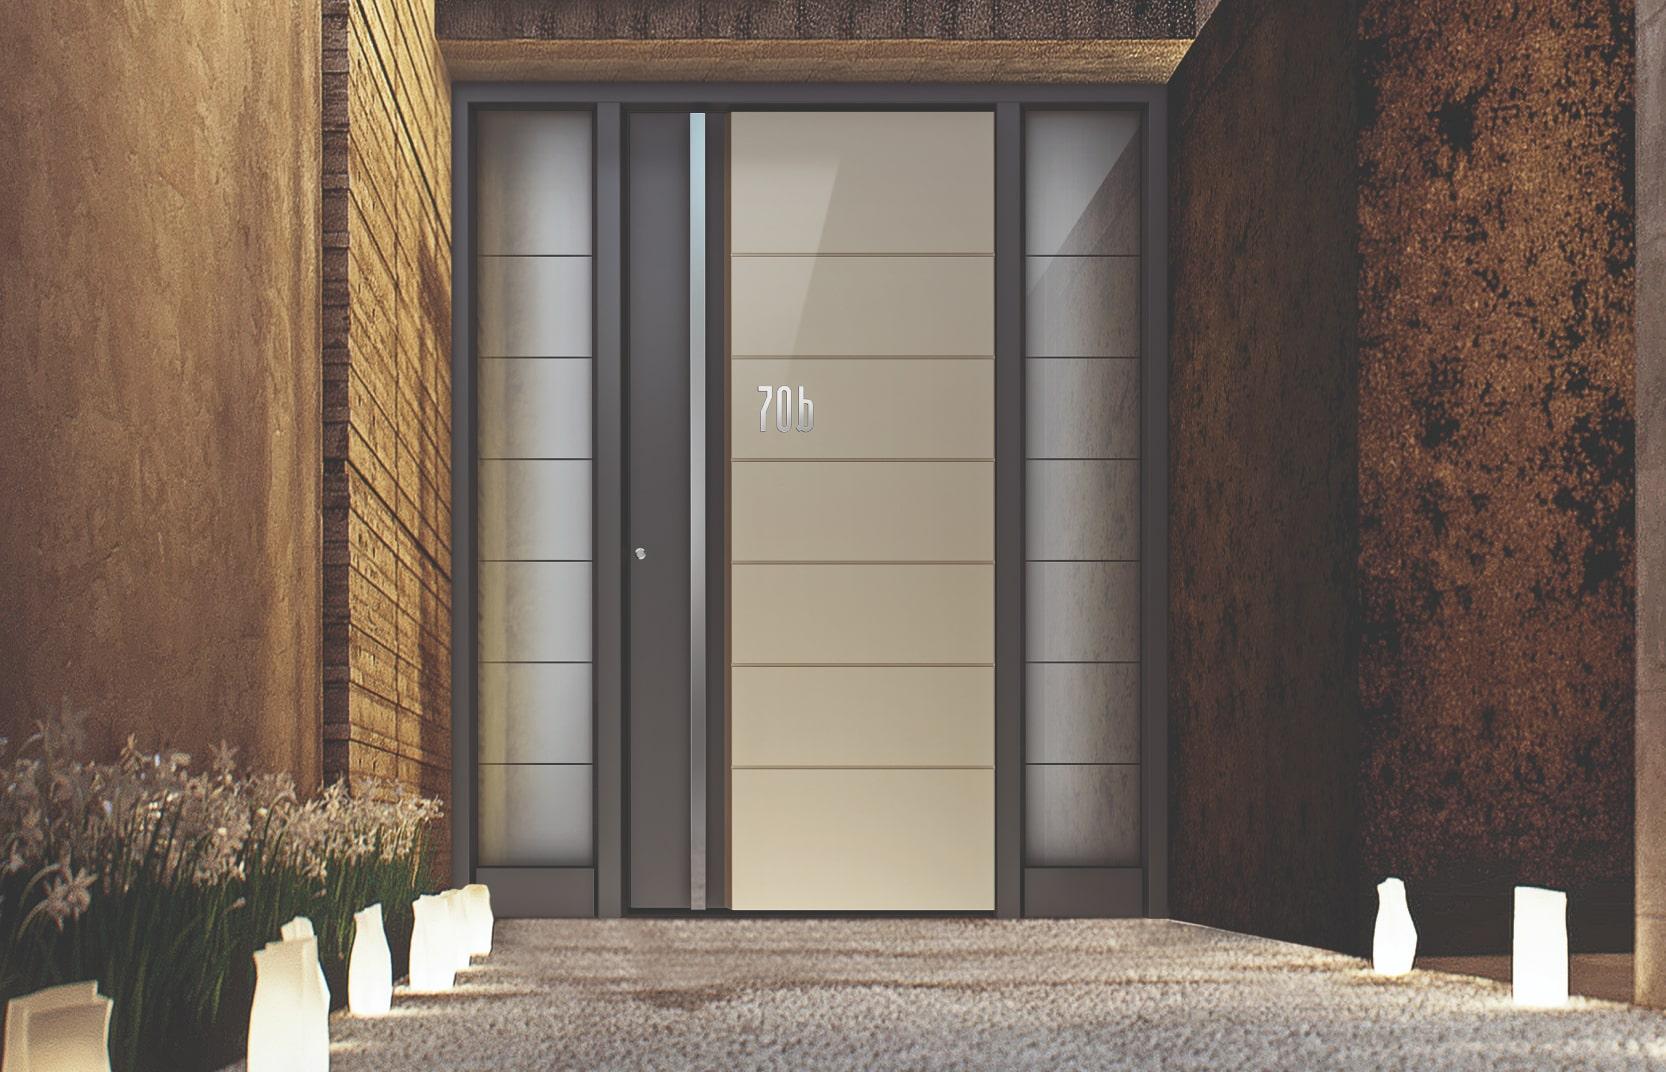 Fabulous Haustüren günstig kaufen | Aktionsangebote bei Haustueren.de YZ89